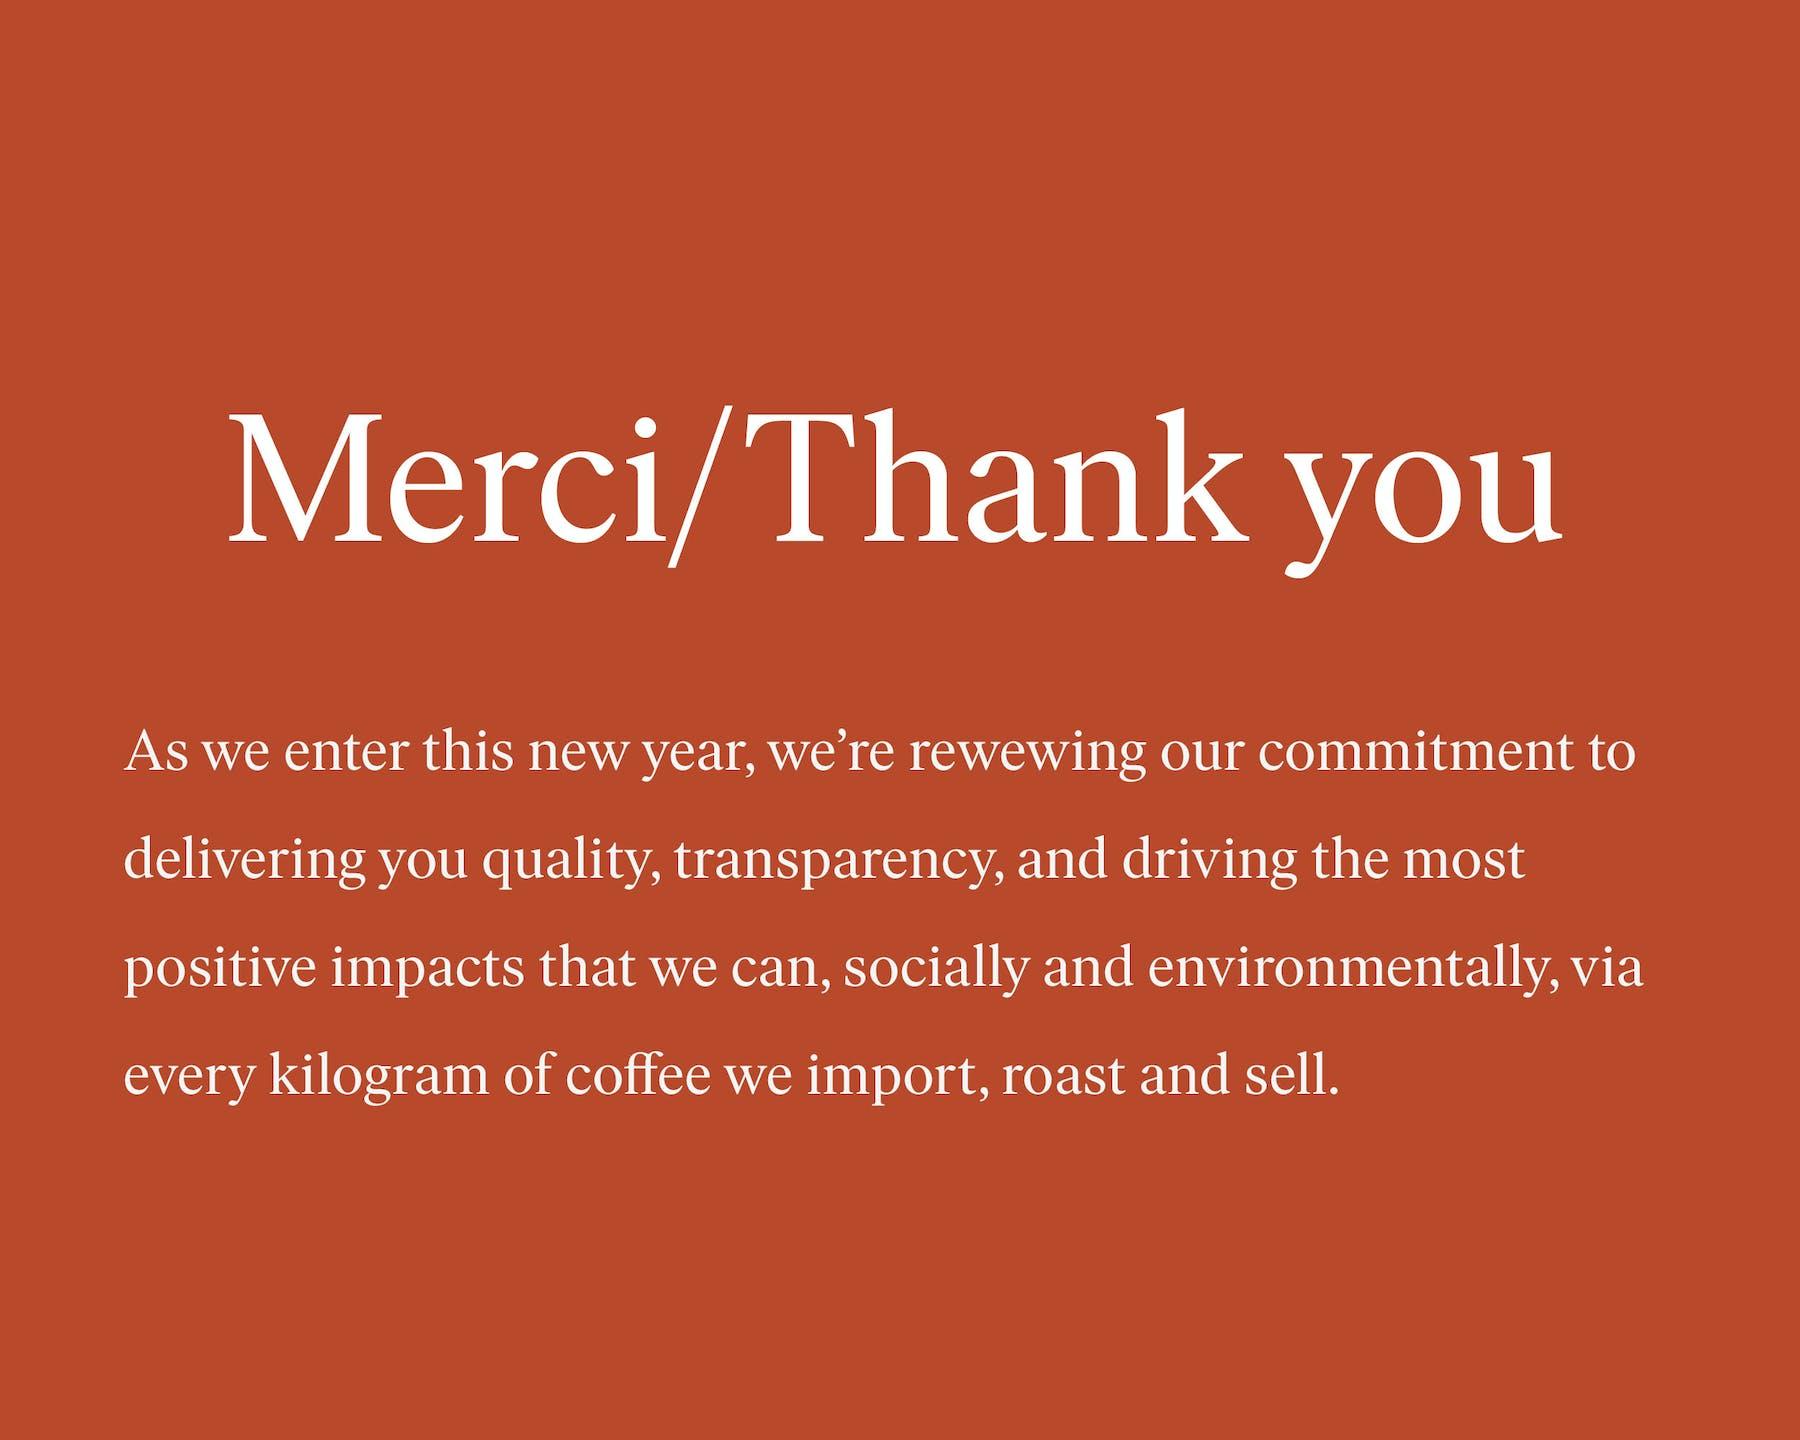 Merci/Thanks 2020 Blog Post